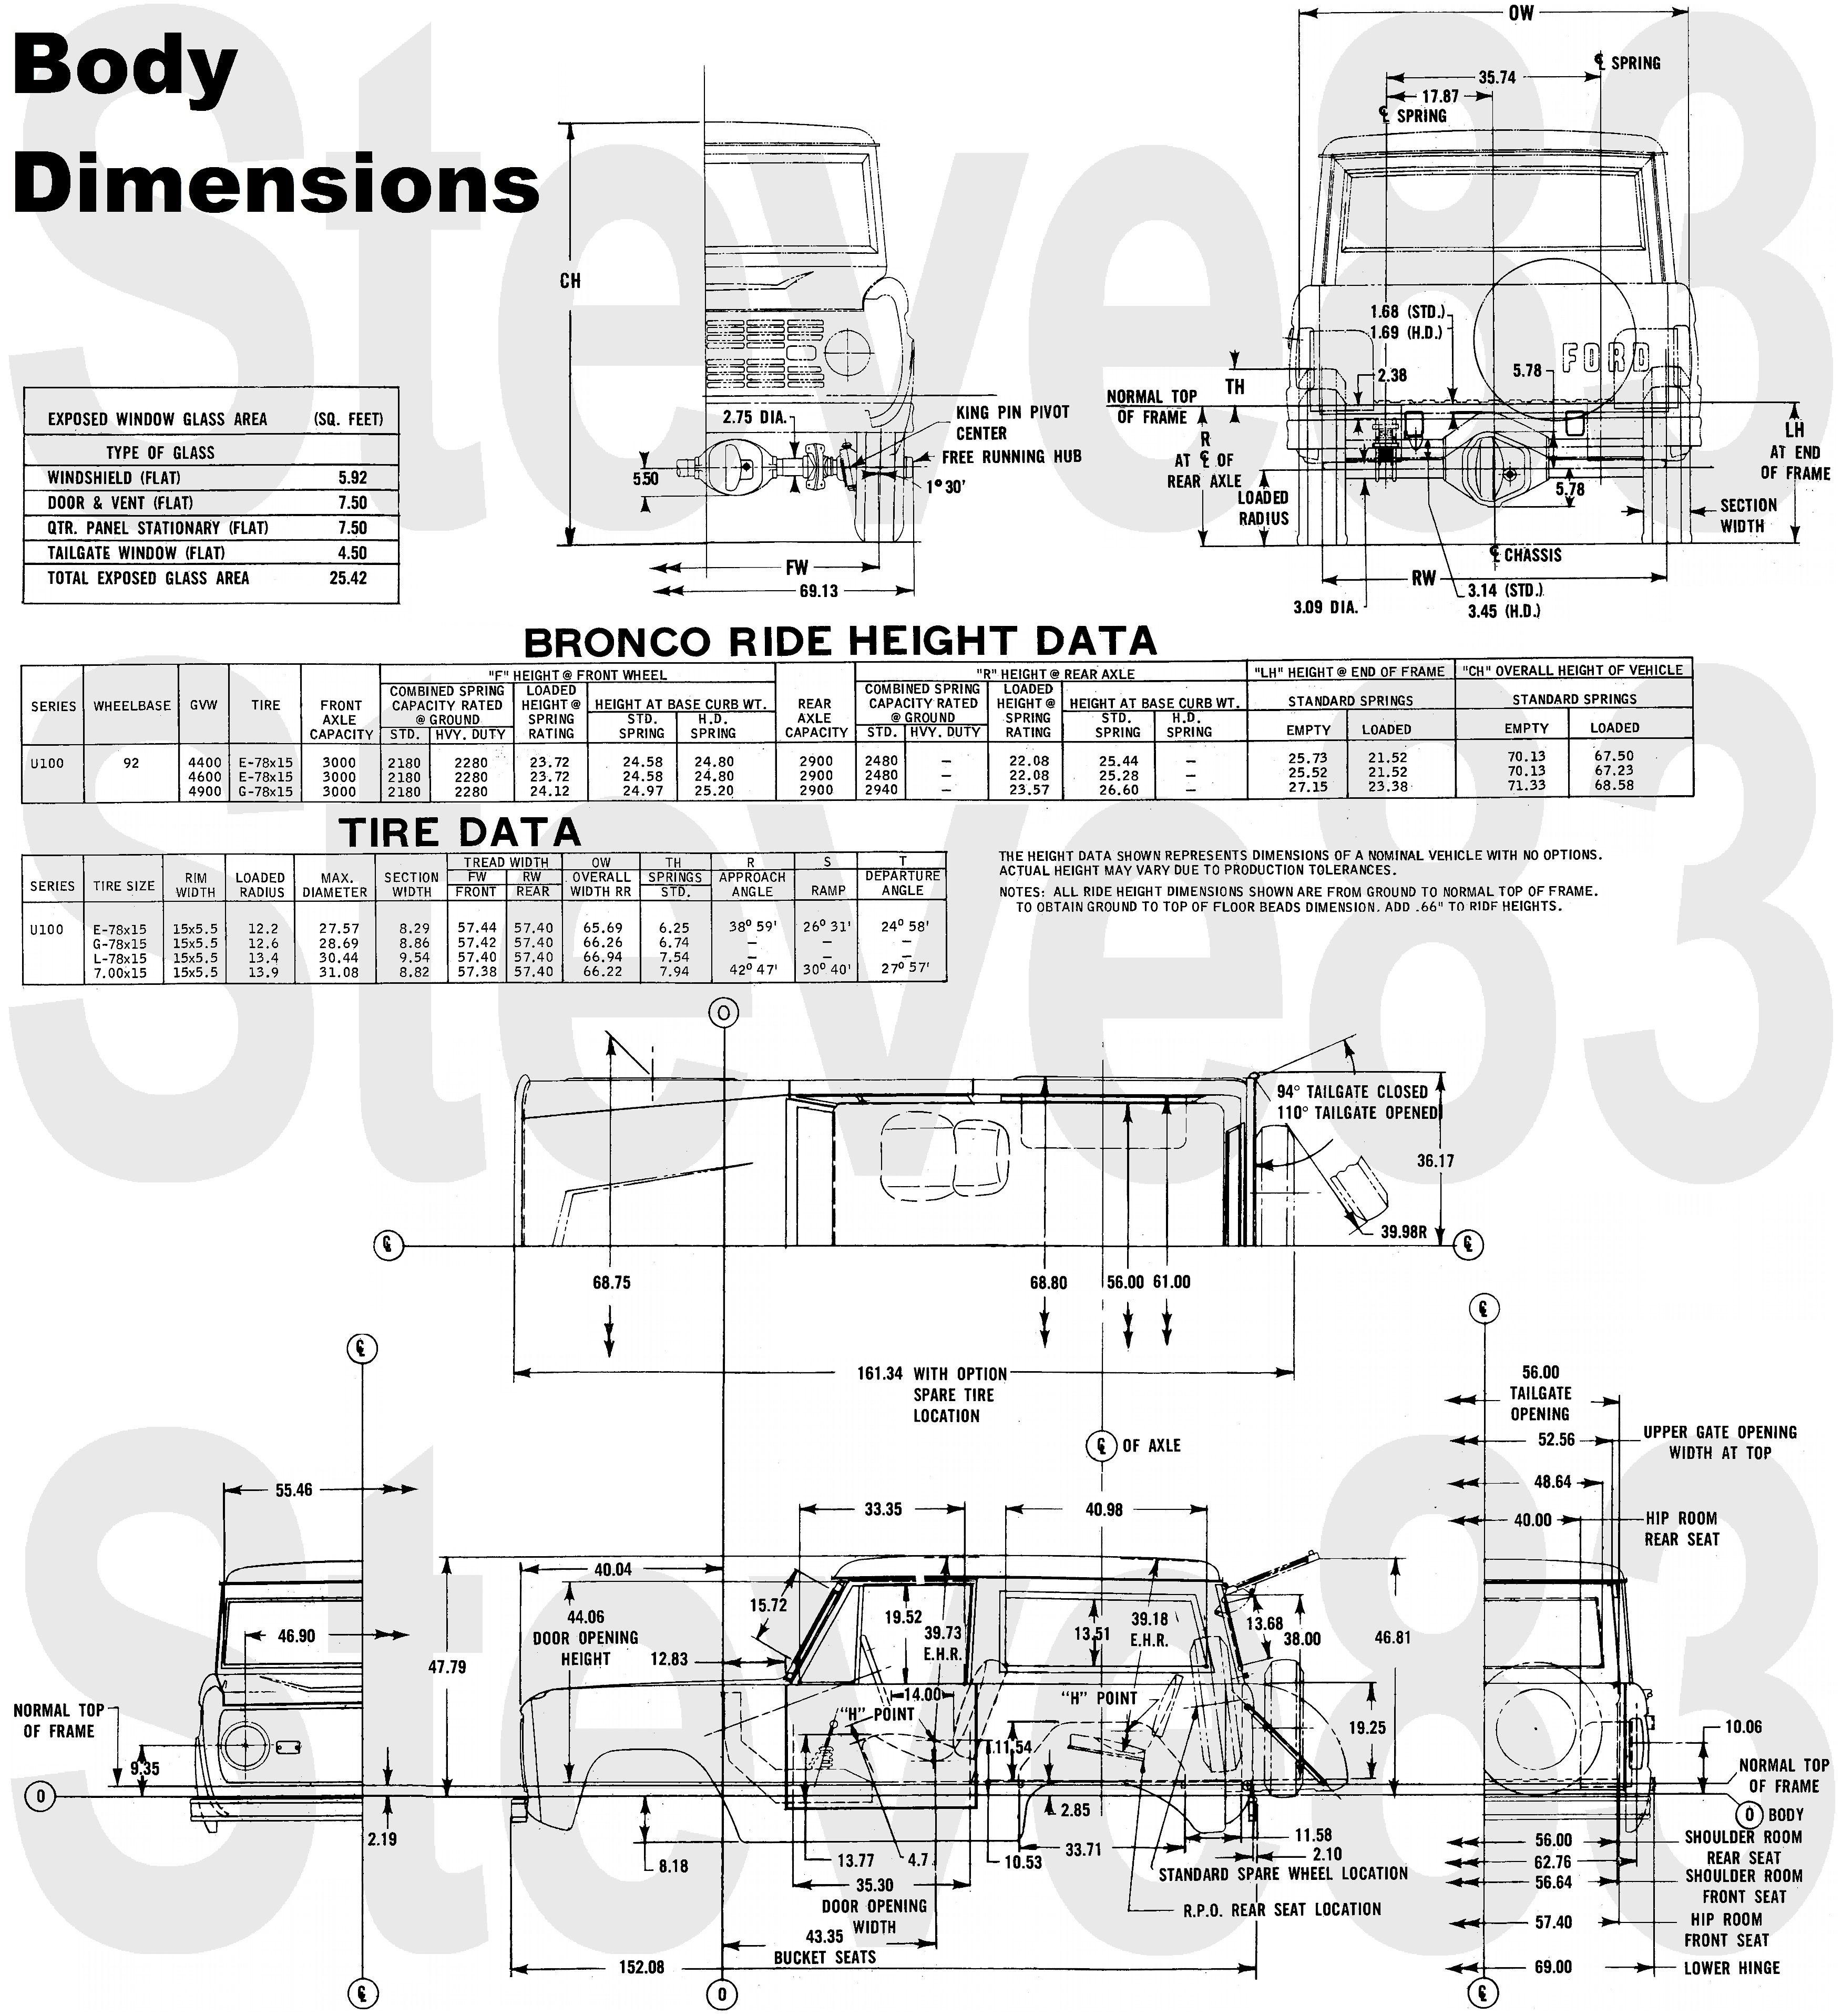 medium resolution of ford bronco frame diagram basic guide wiring diagram u2022 1974 ford bronco 302 vacuum diagram